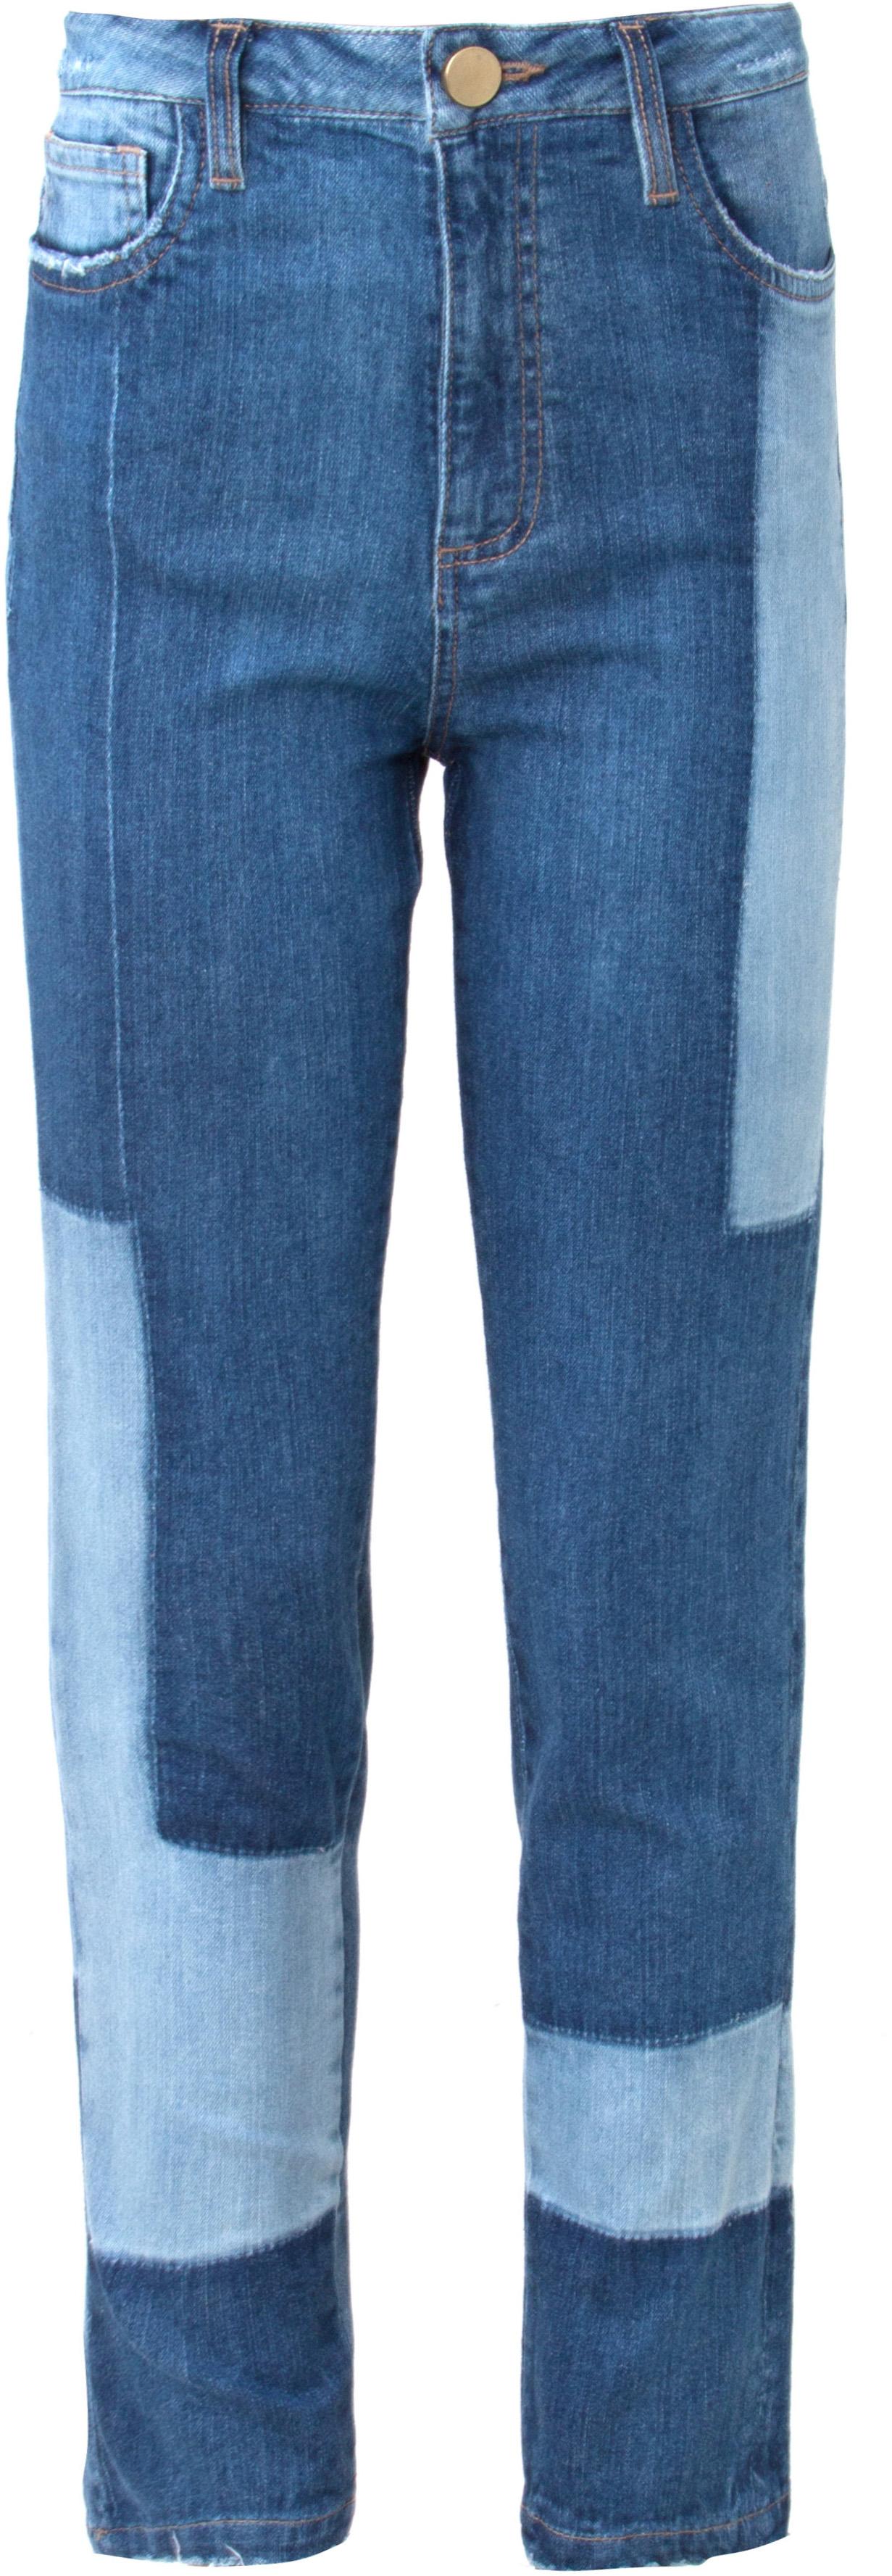 Calca Jeans High Nina